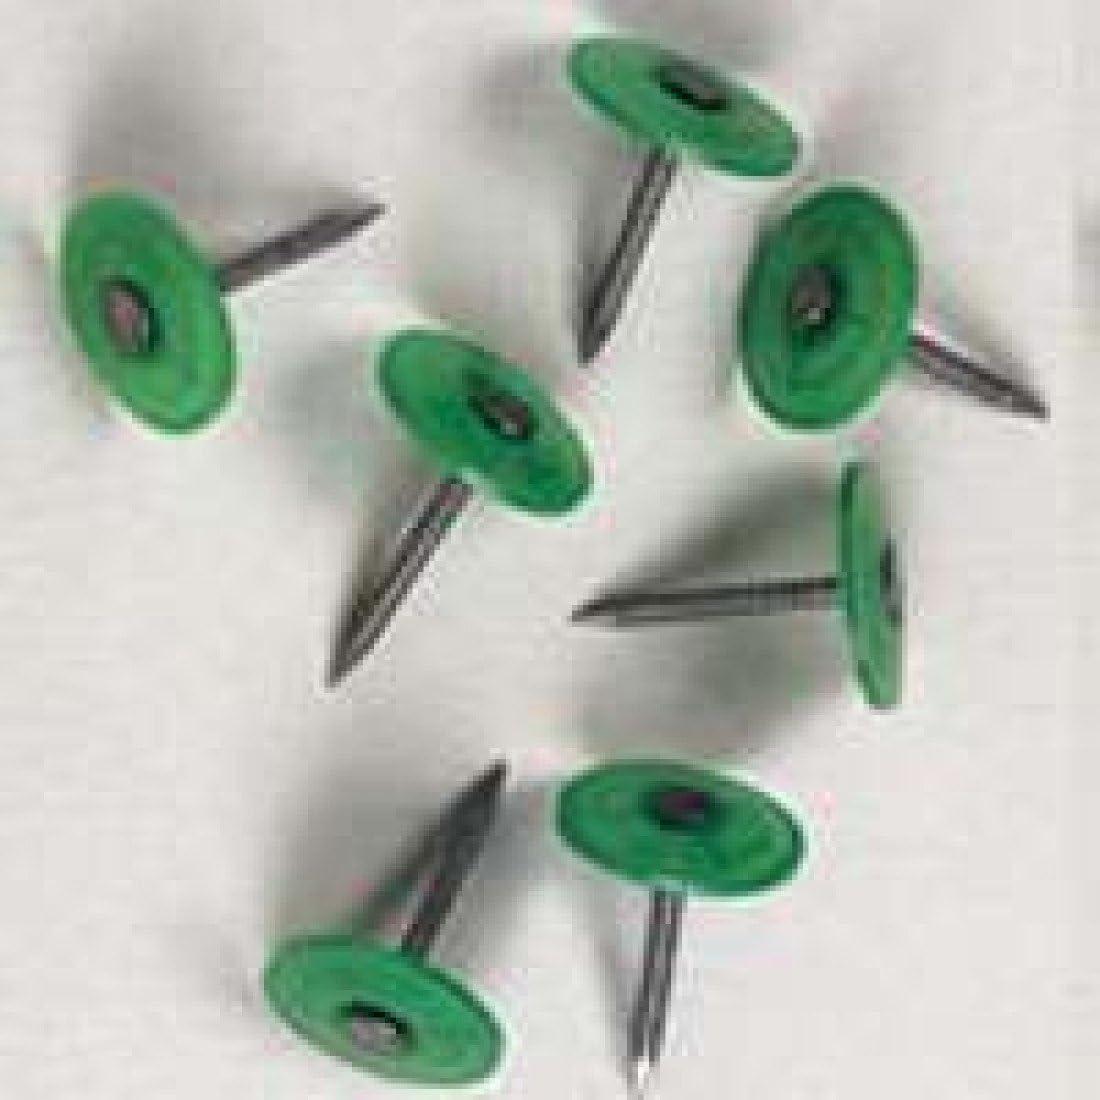 National Nail 0135113 1-3 5 ☆ popular Cap 4in 2k Brand Cheap Sale Venue Plastic